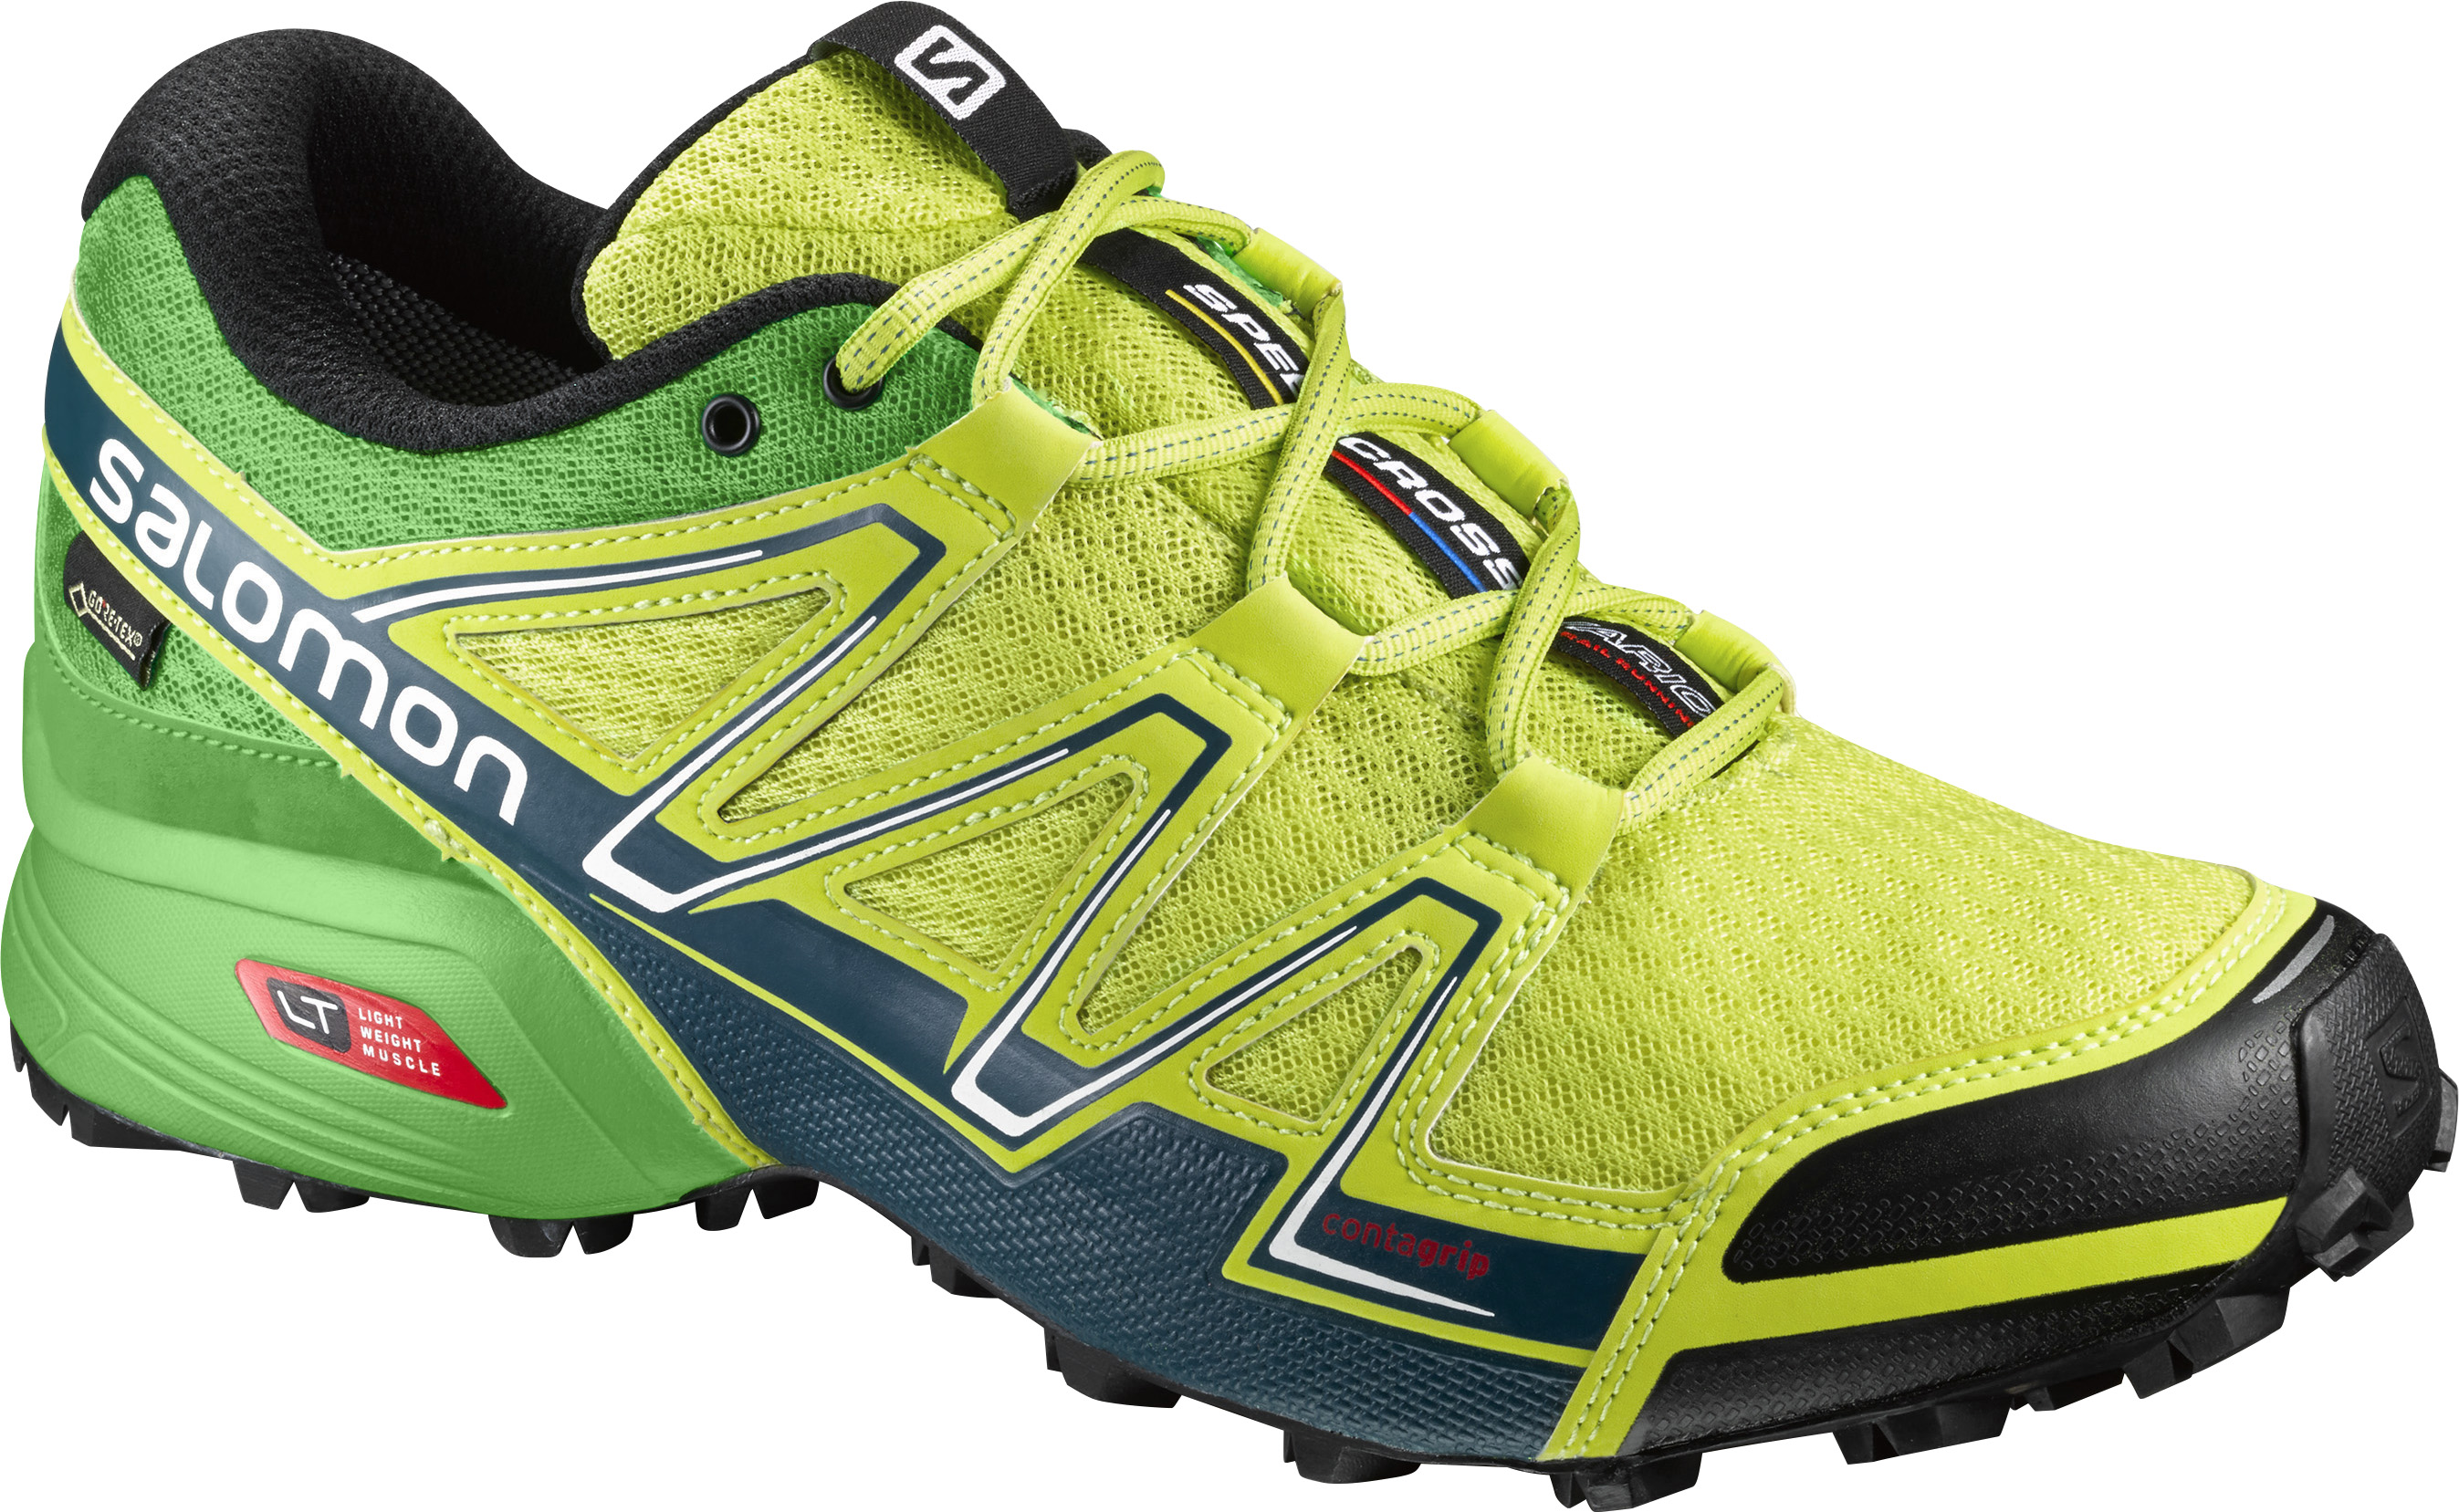 8a5f6465c17 Trailová obuv - Pánská obuv Salomon